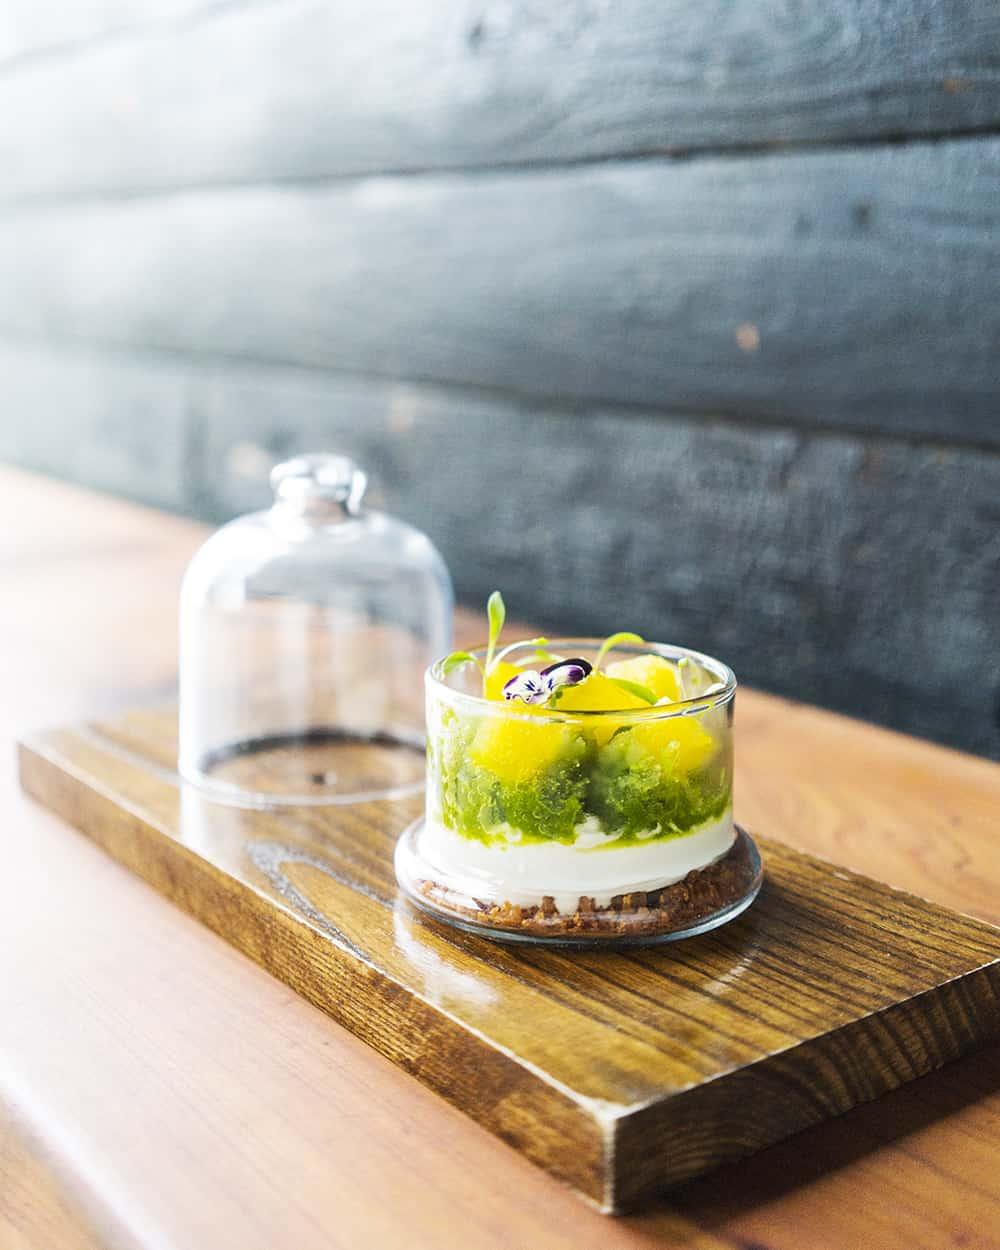 Jasmine Green Dessert